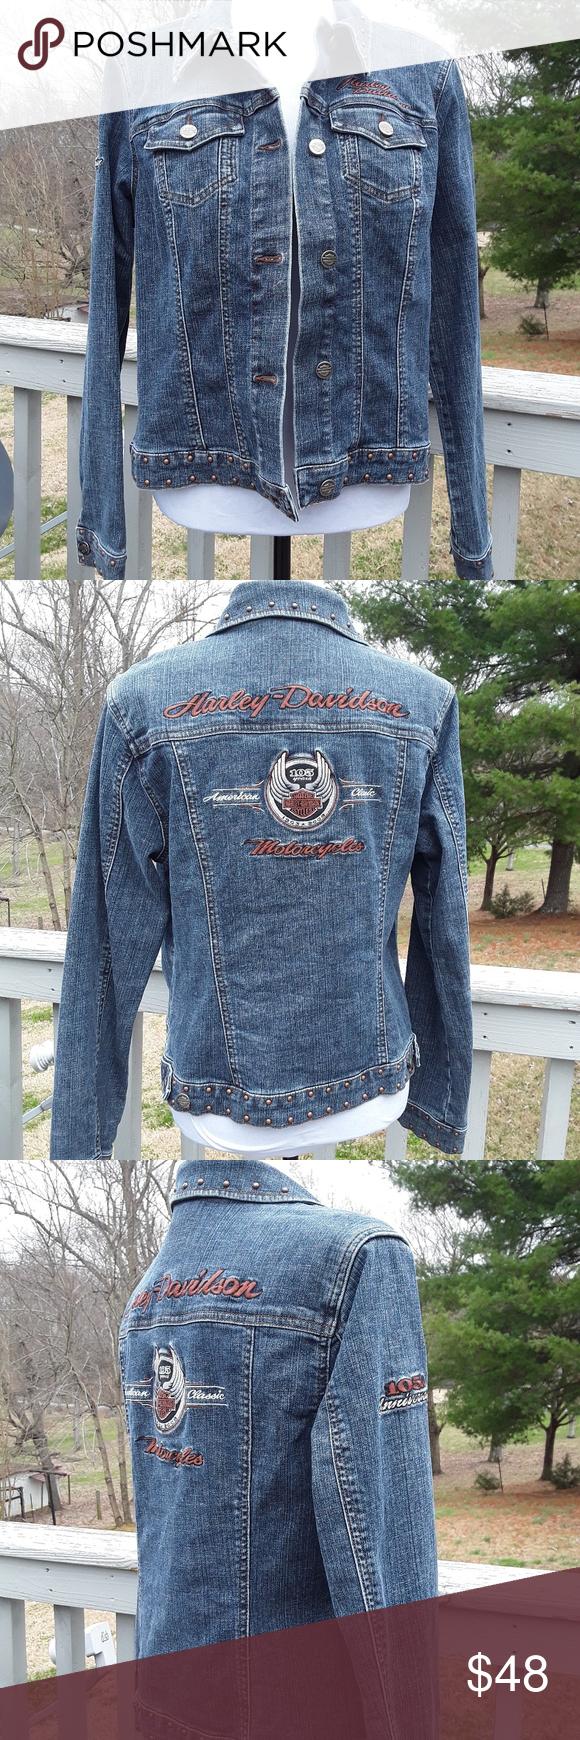 Womens Harley Davidson Jean Jacket Sz L Harley Davidson Jean Jacket Harley Davidson Jeans Jackets [ 1740 x 580 Pixel ]